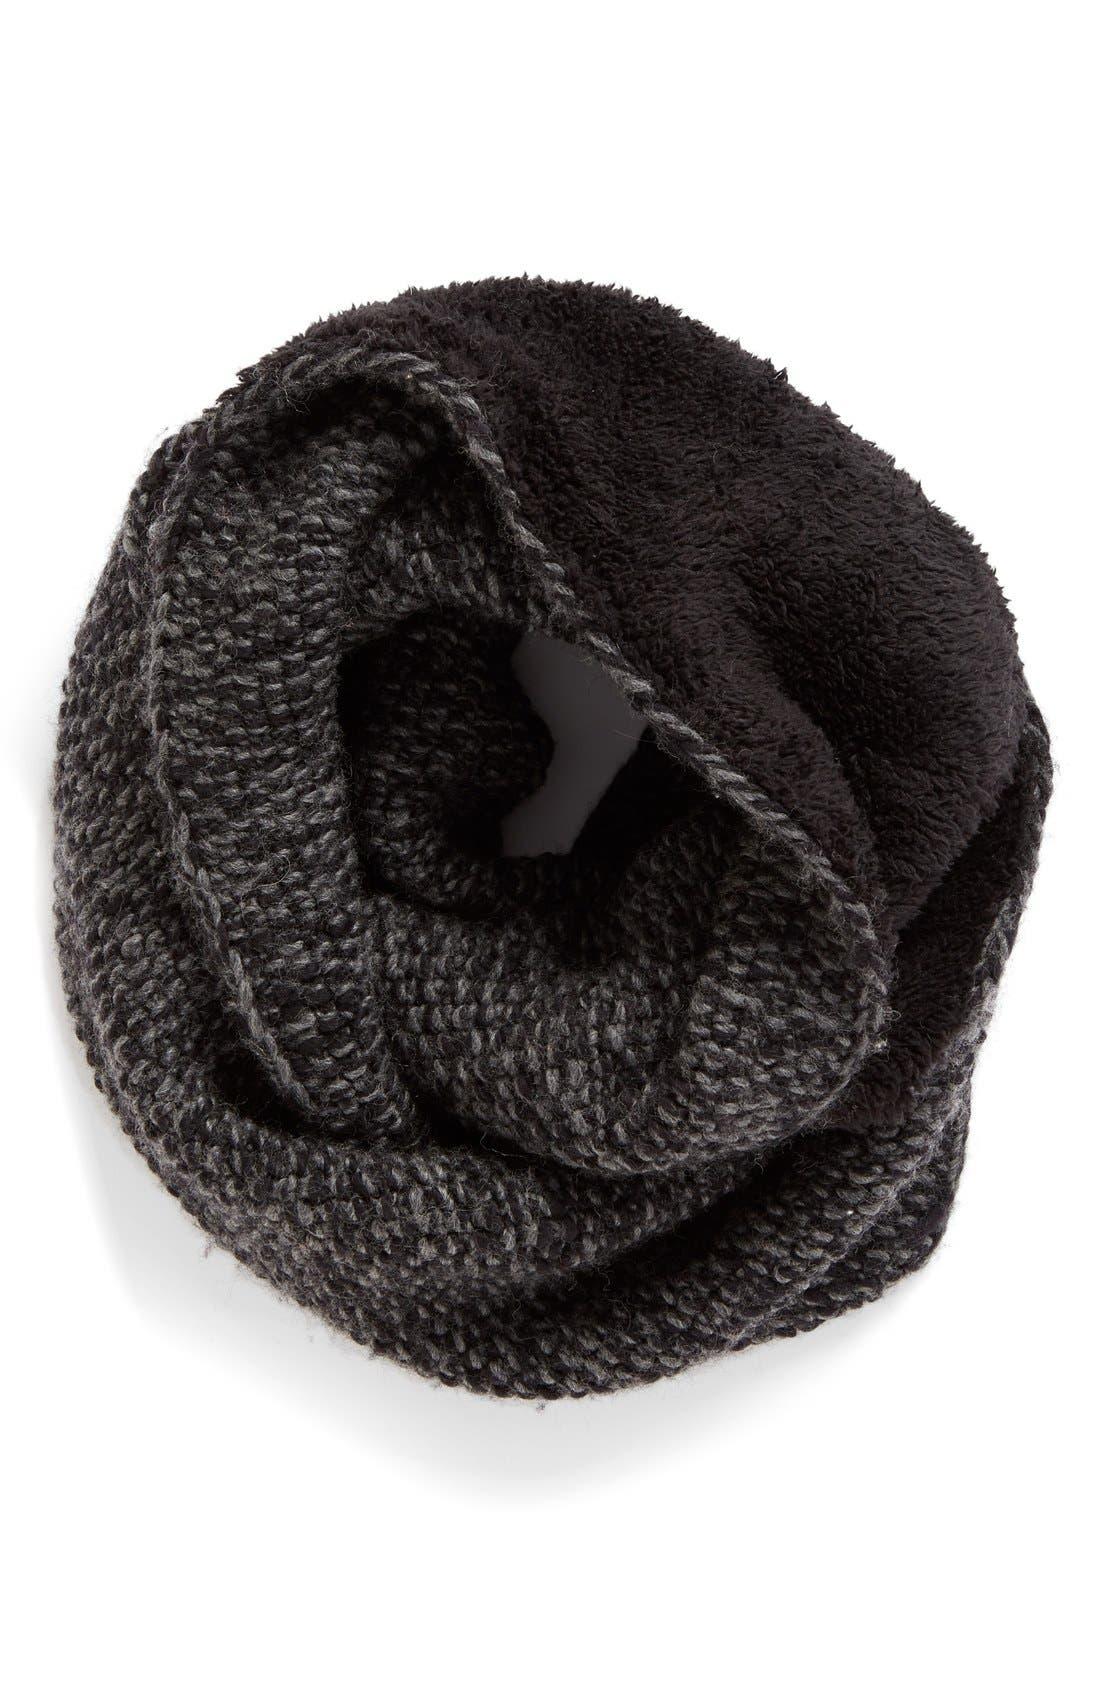 Alternate Image 1 Selected - Nirvanna Designs Knit Wool Infinity Scarf